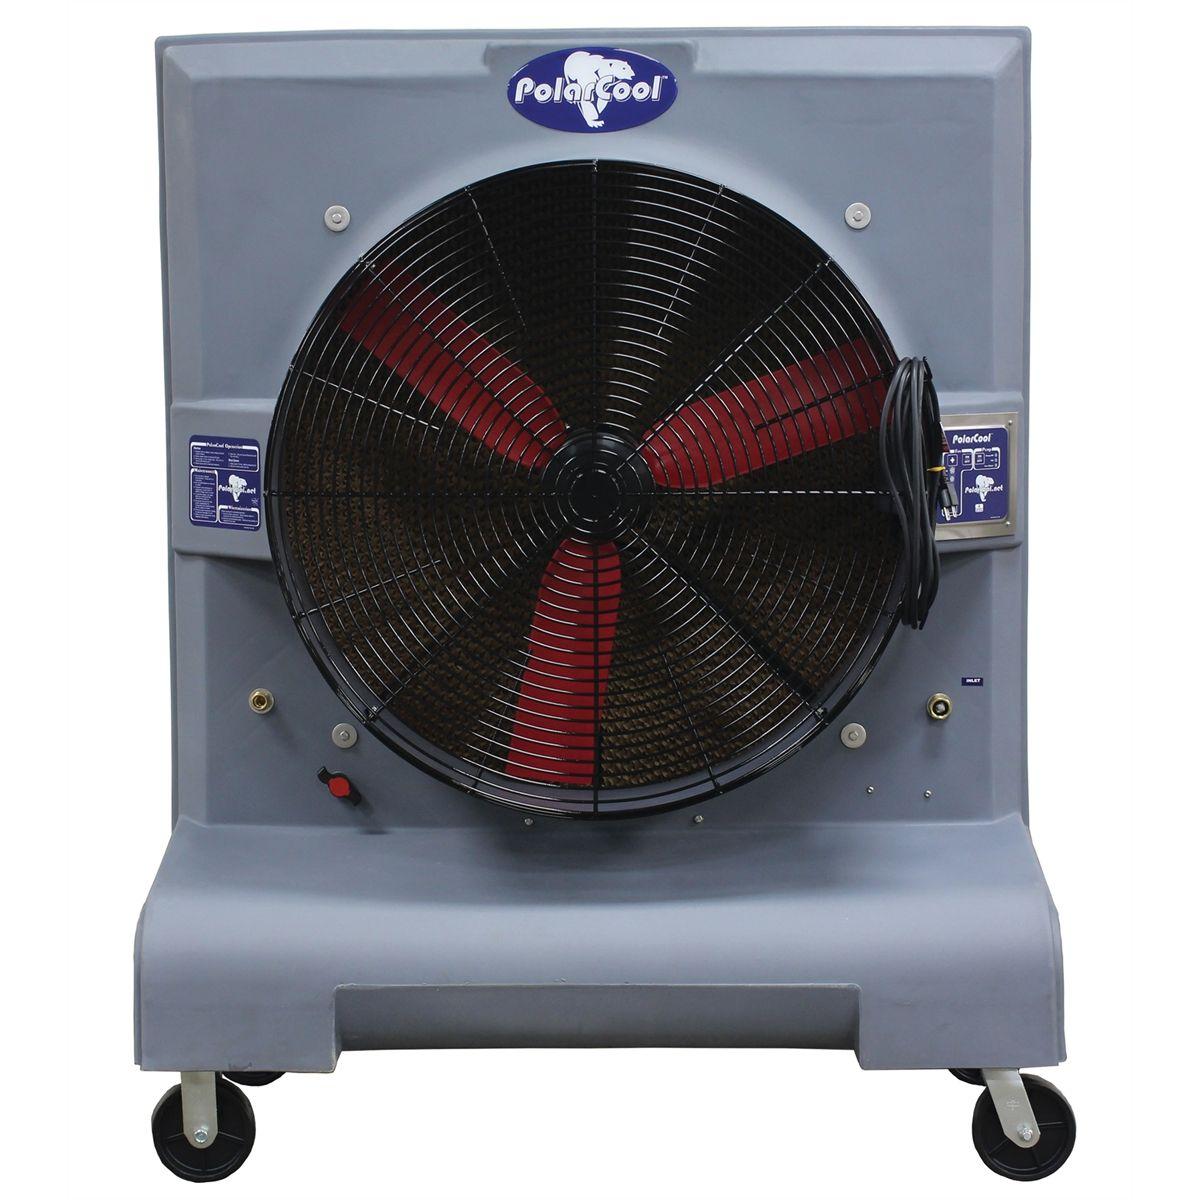 Portable Cooling Fans : Zone k portable evaporative cooling fan polarcool